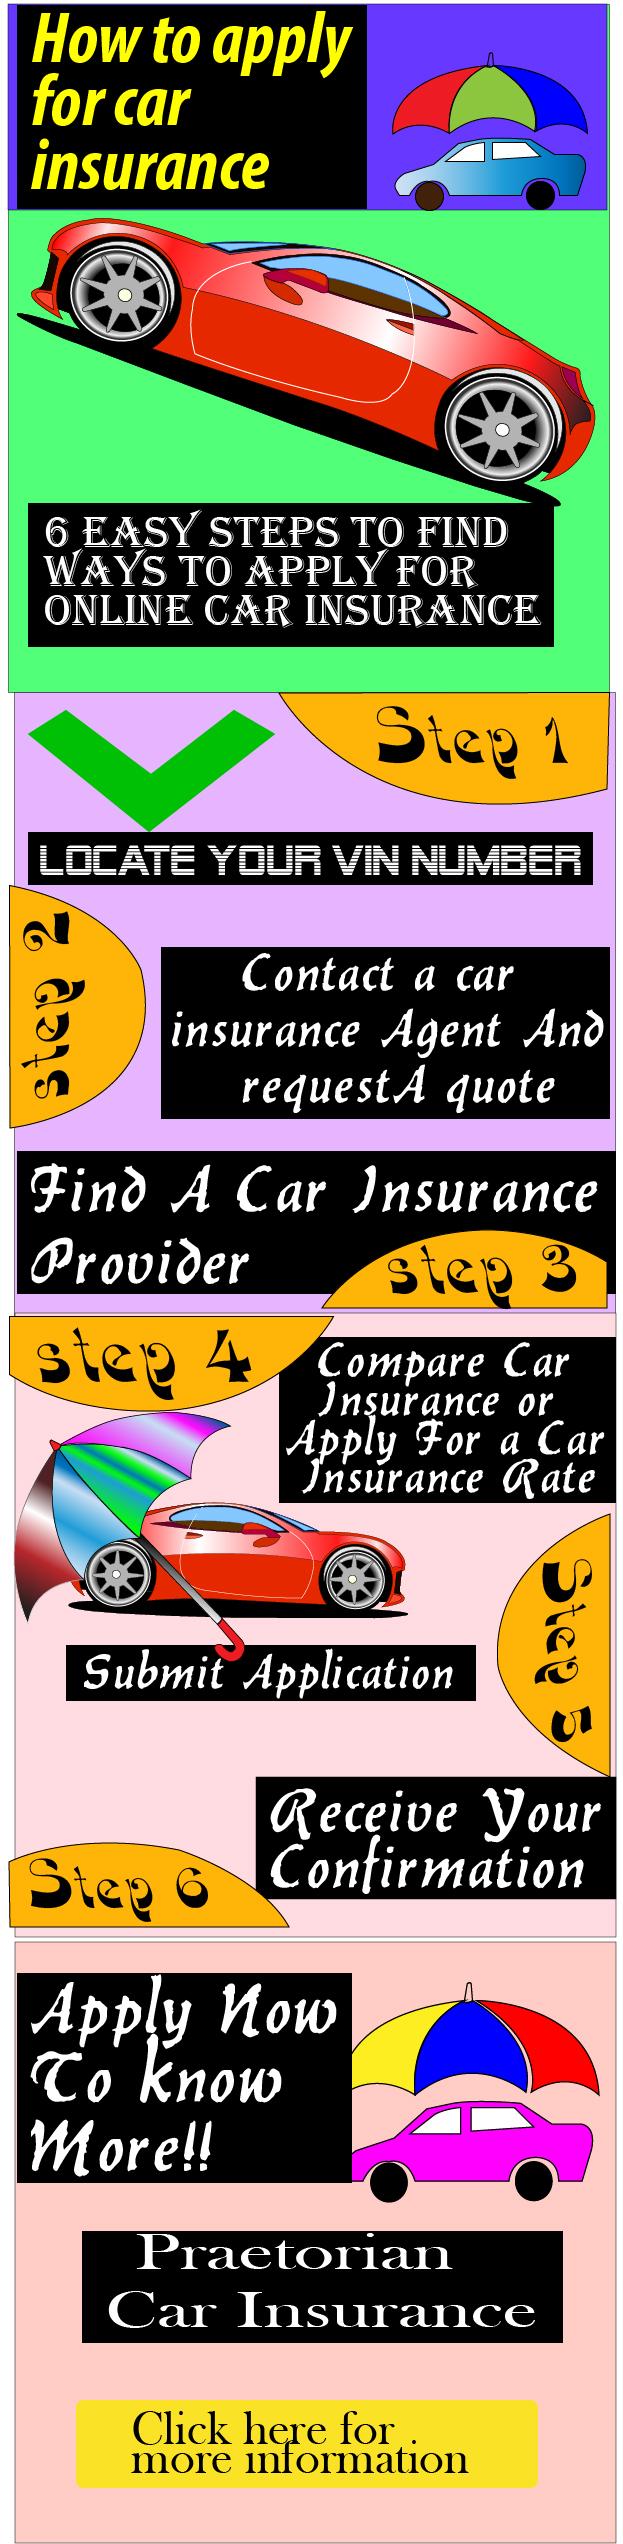 Praetorian Auto Insurance